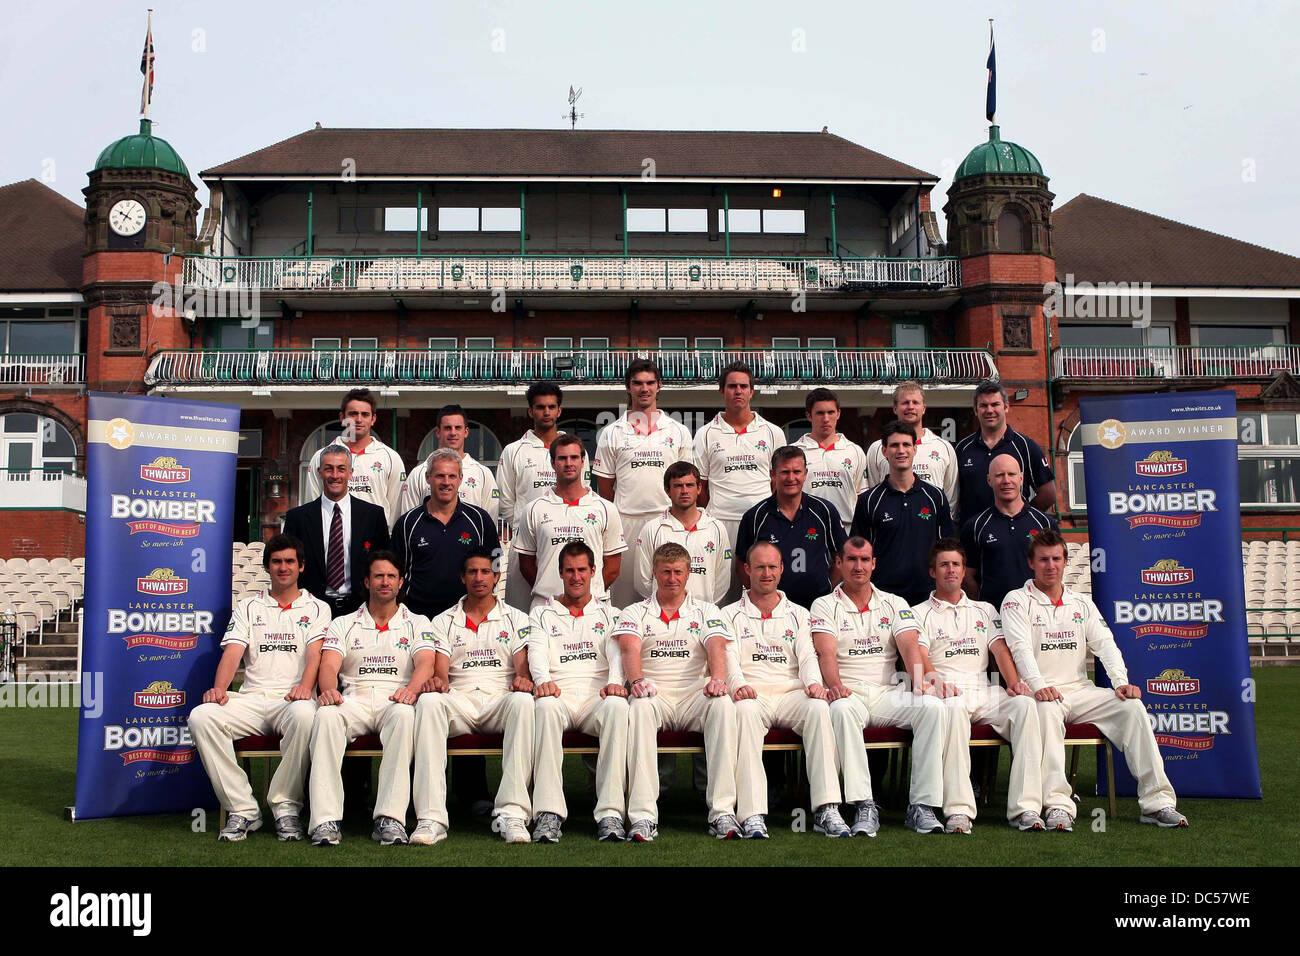 Le Lancashire County Cricket Club photocall le 6 avril 2009. Photo Stock